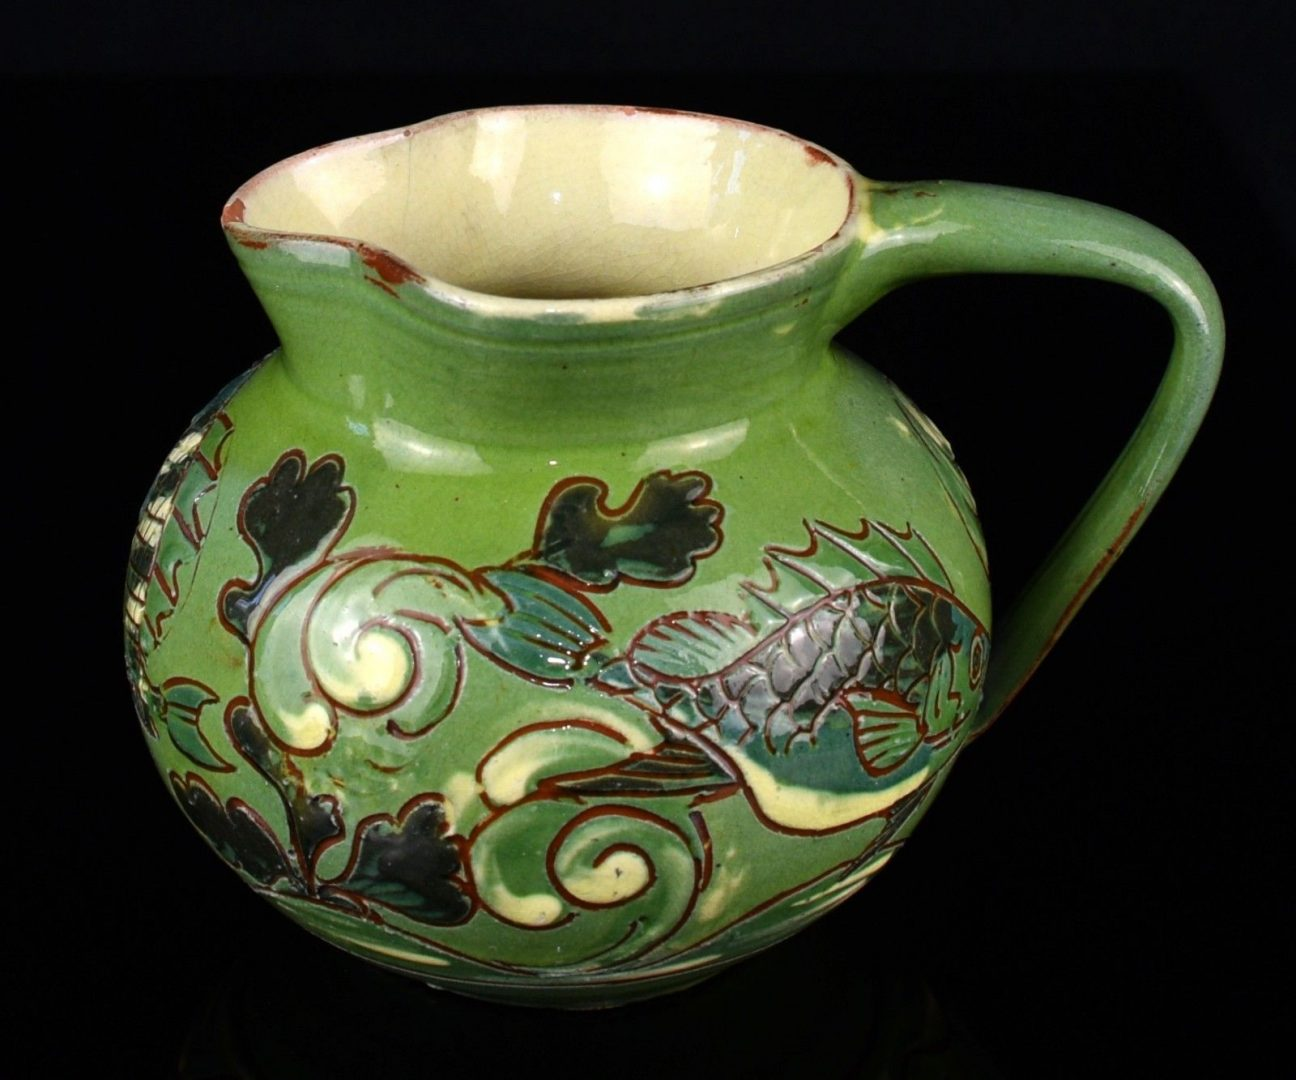 C H Brannam Barum 1892 Green Studio Arts Crafts Pottery Fish Jug Vase Pm Antiques Collectables